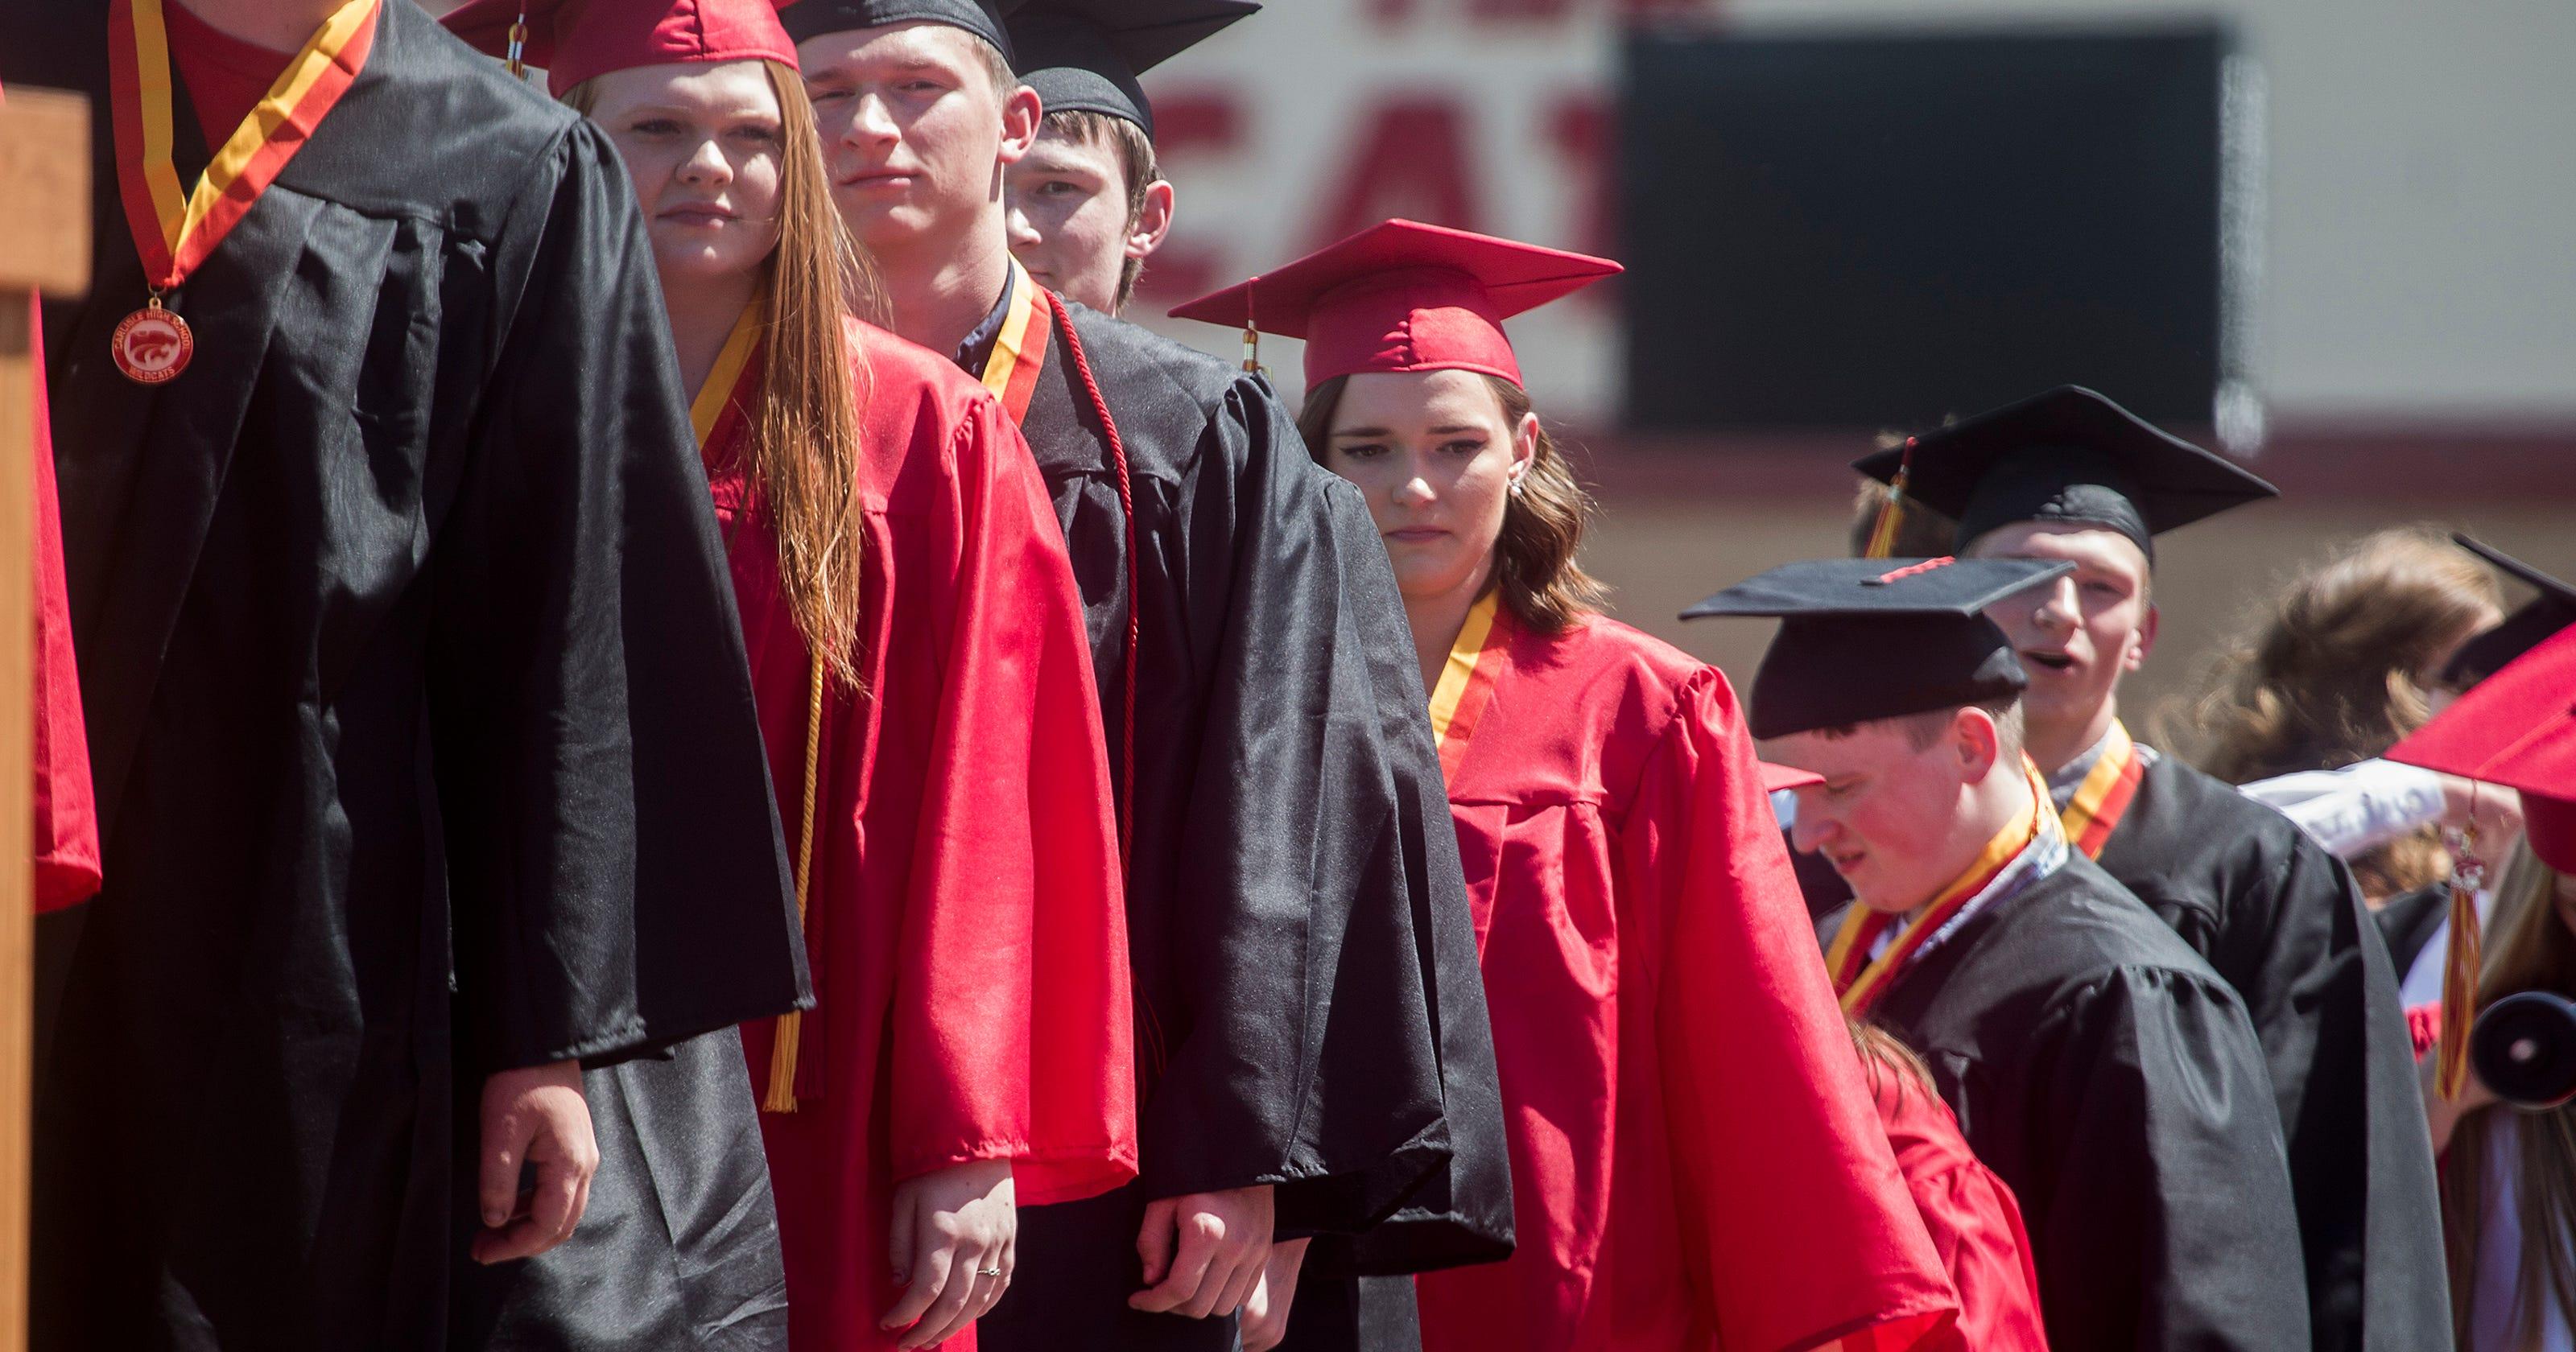 Congrats x 7: McCaughey septuplets graduate high school